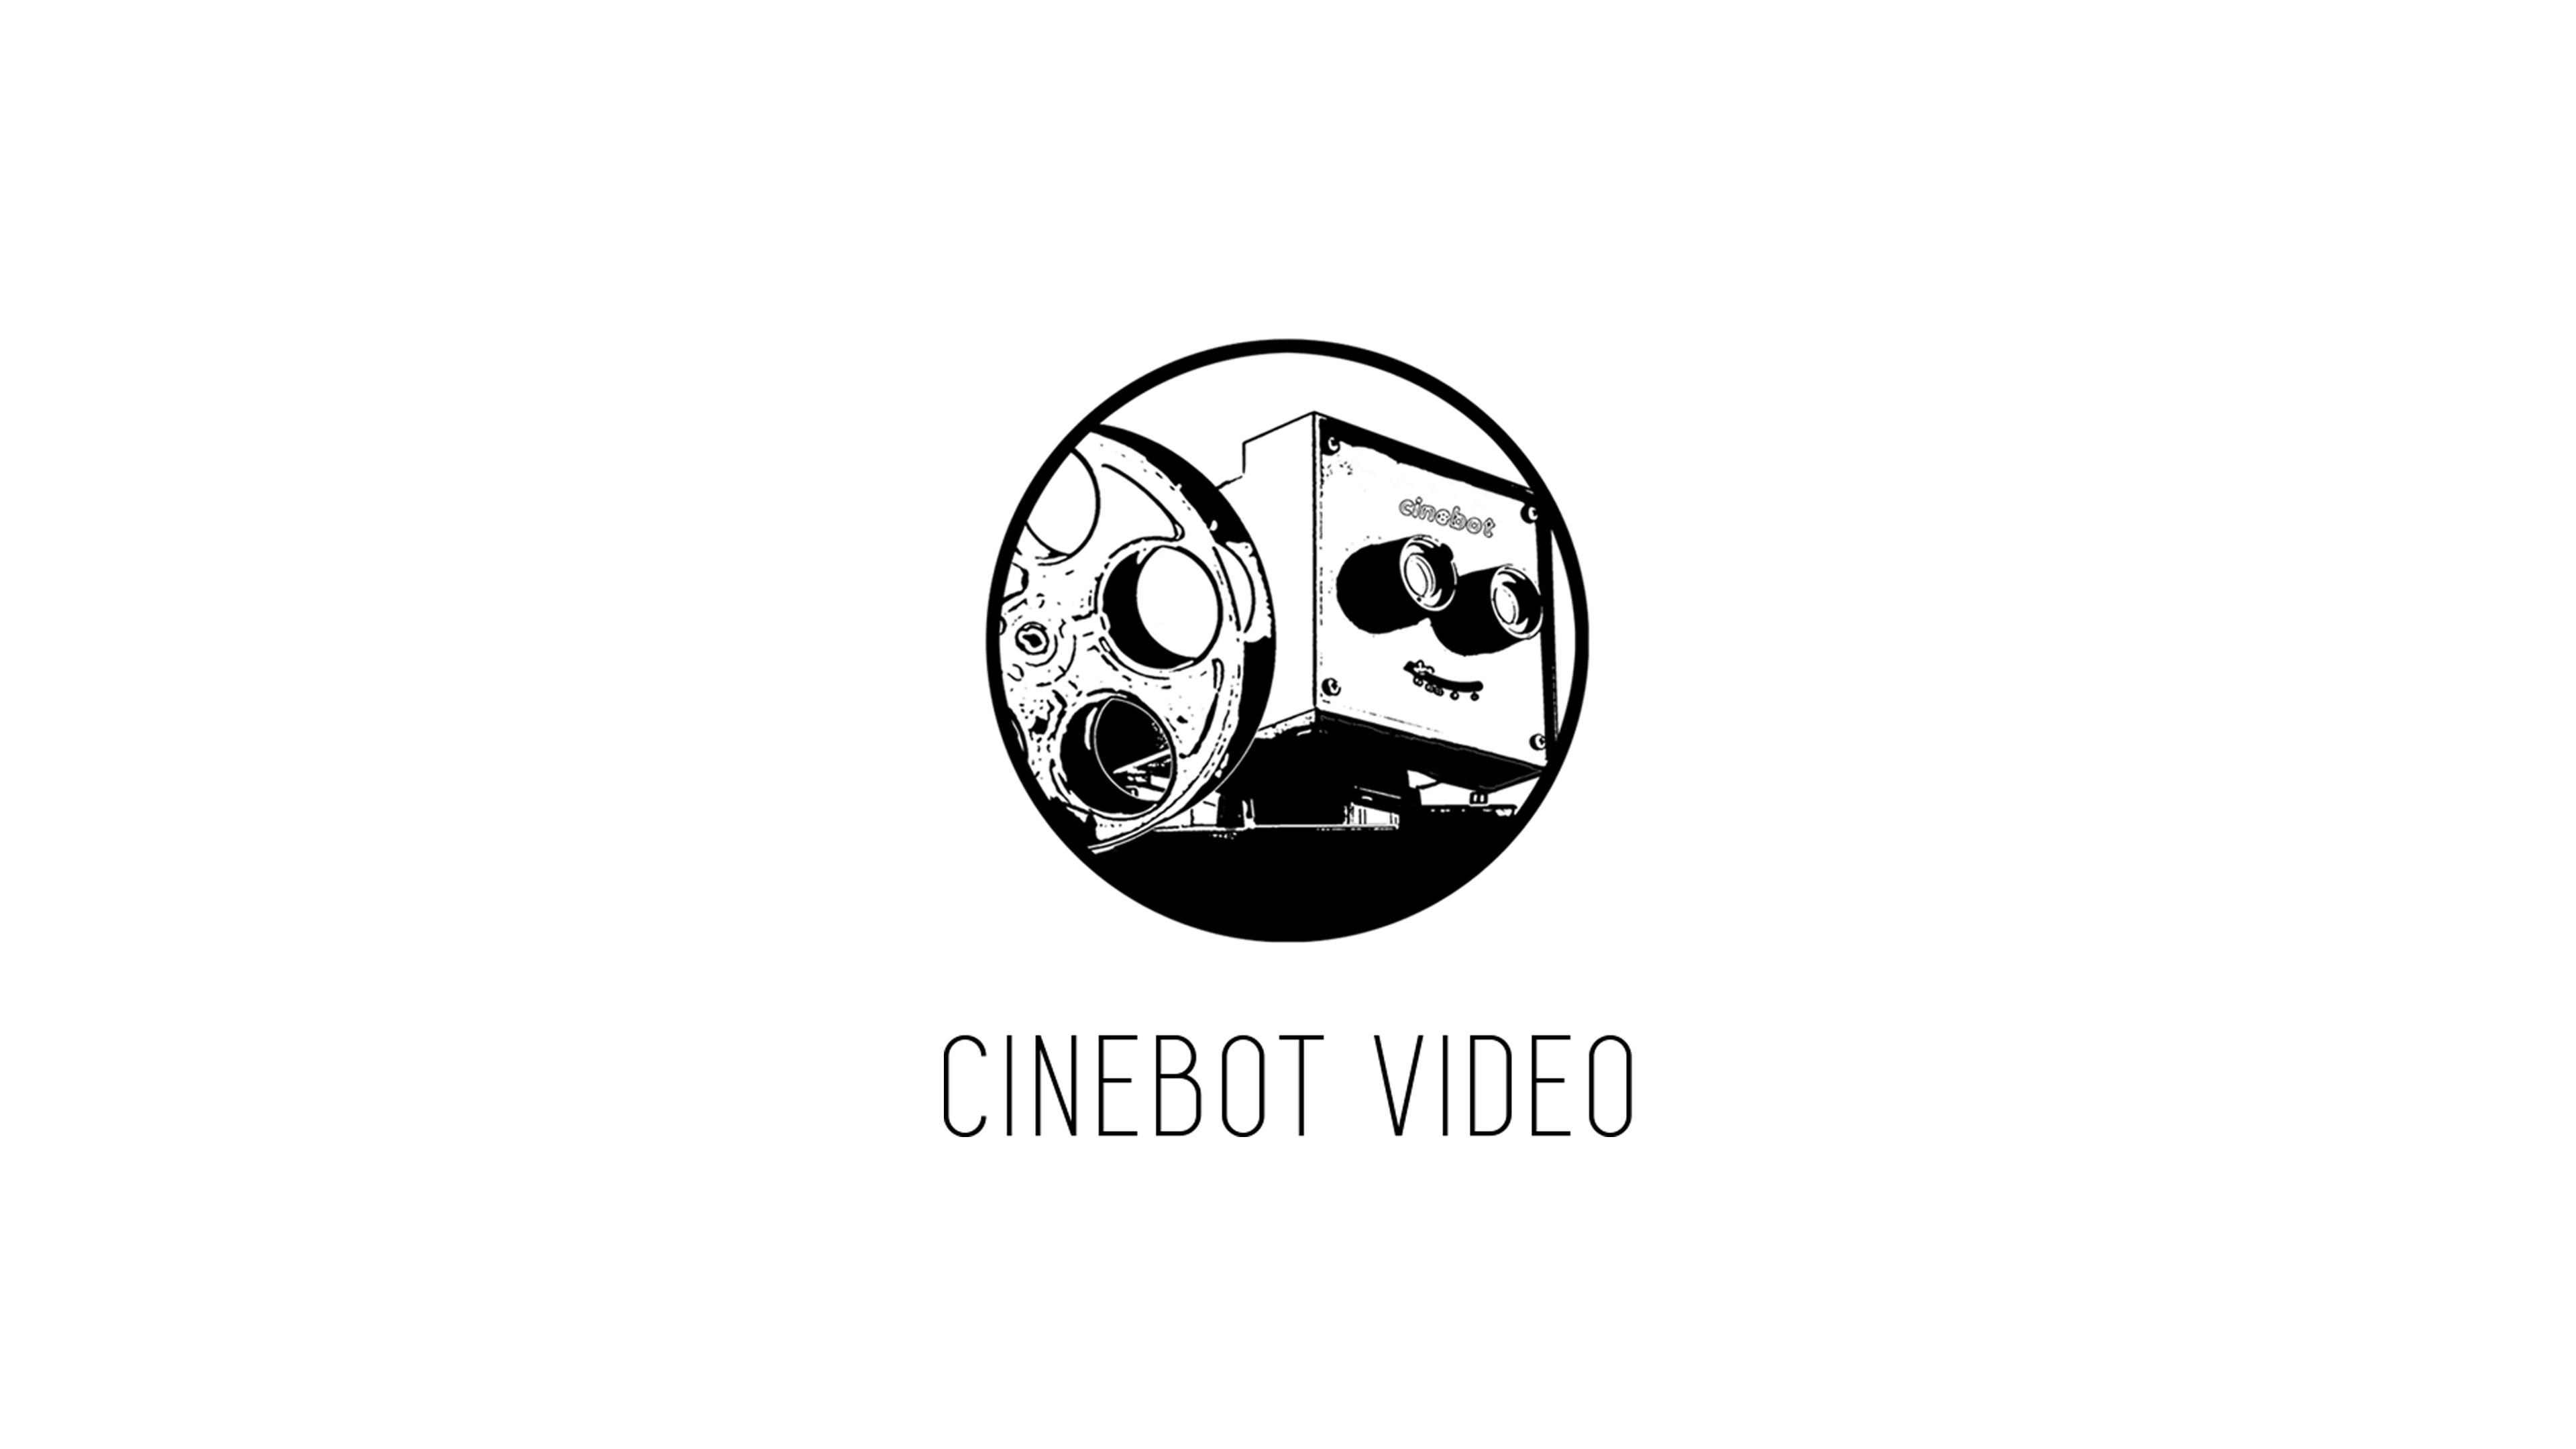 Cinebot Video